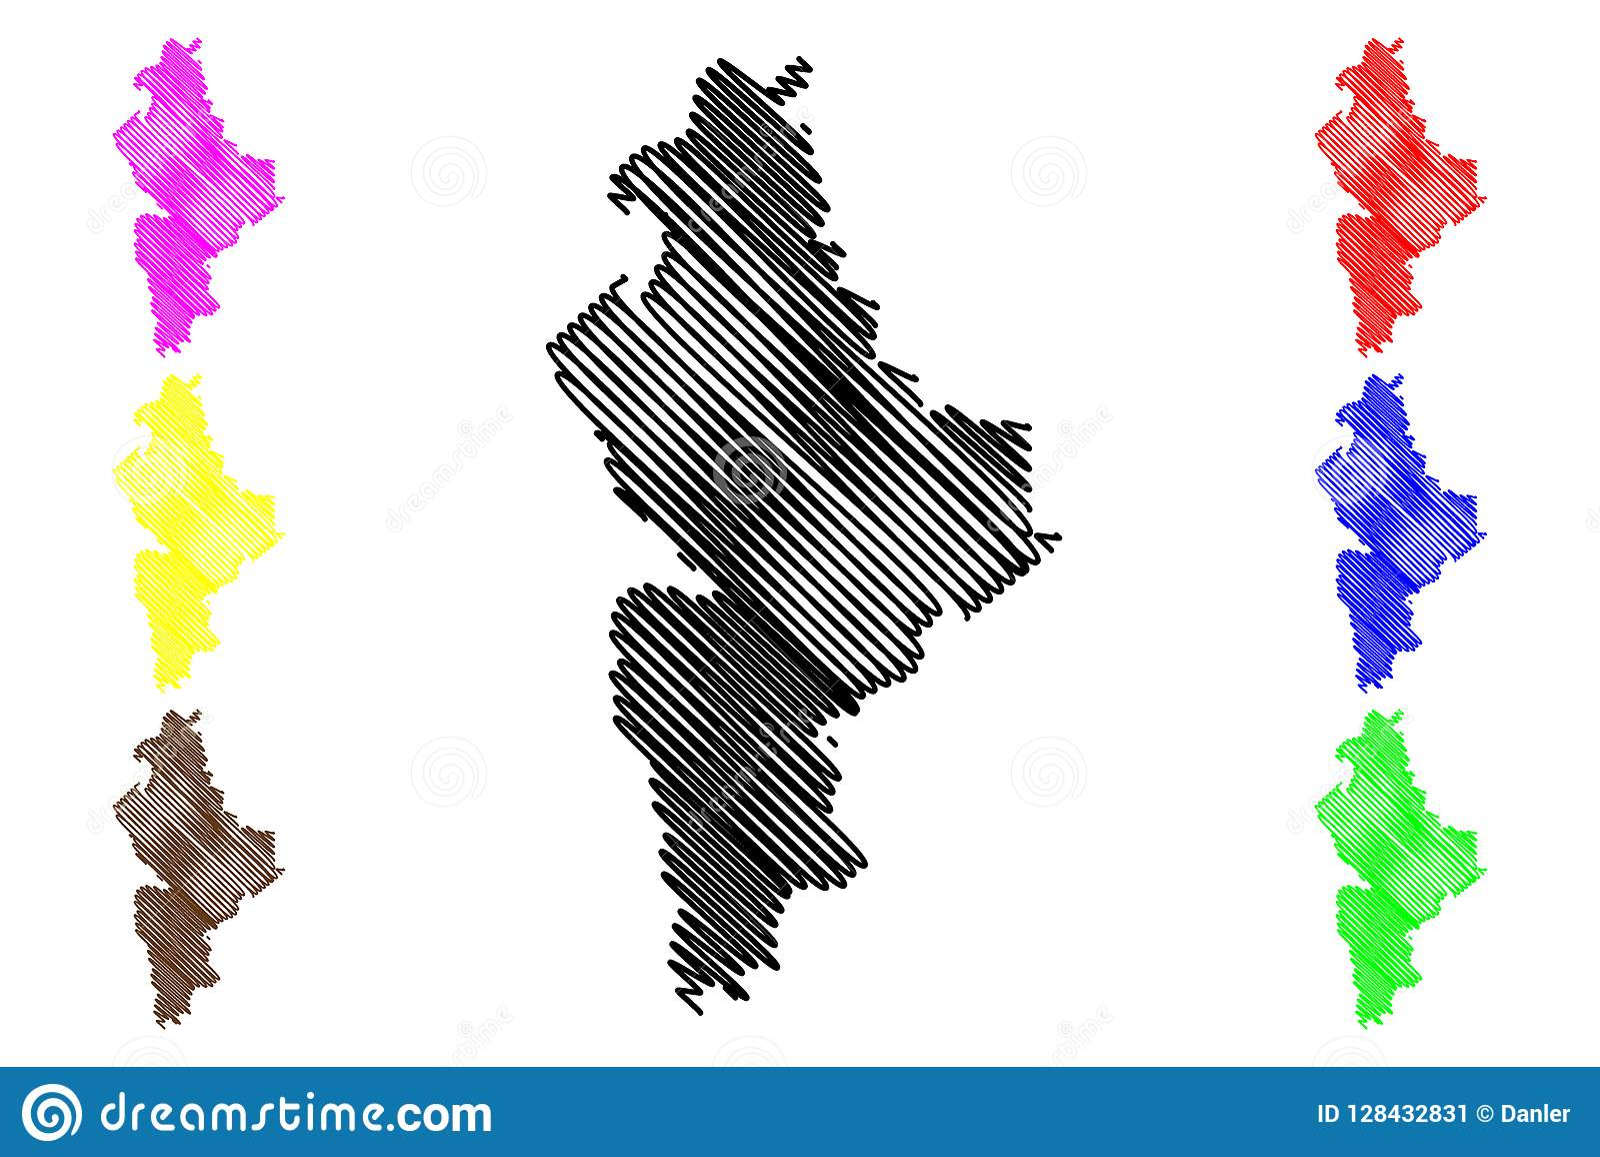 Nuevo Leon Map Vector Stock Vector Illustration Of Icon 128432831